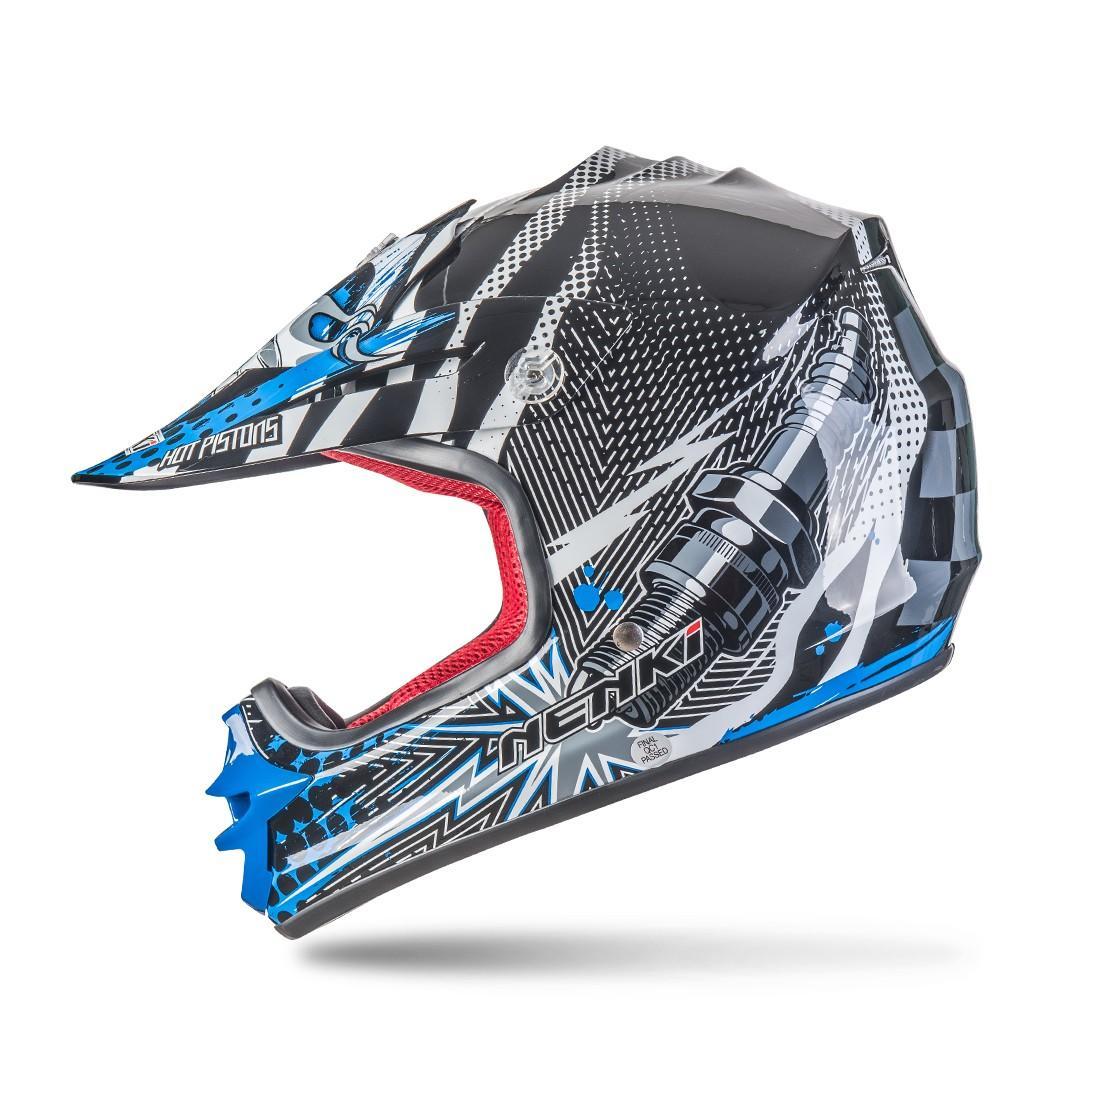 Nenki cool motocross helmets suppliers for motorcycle-2